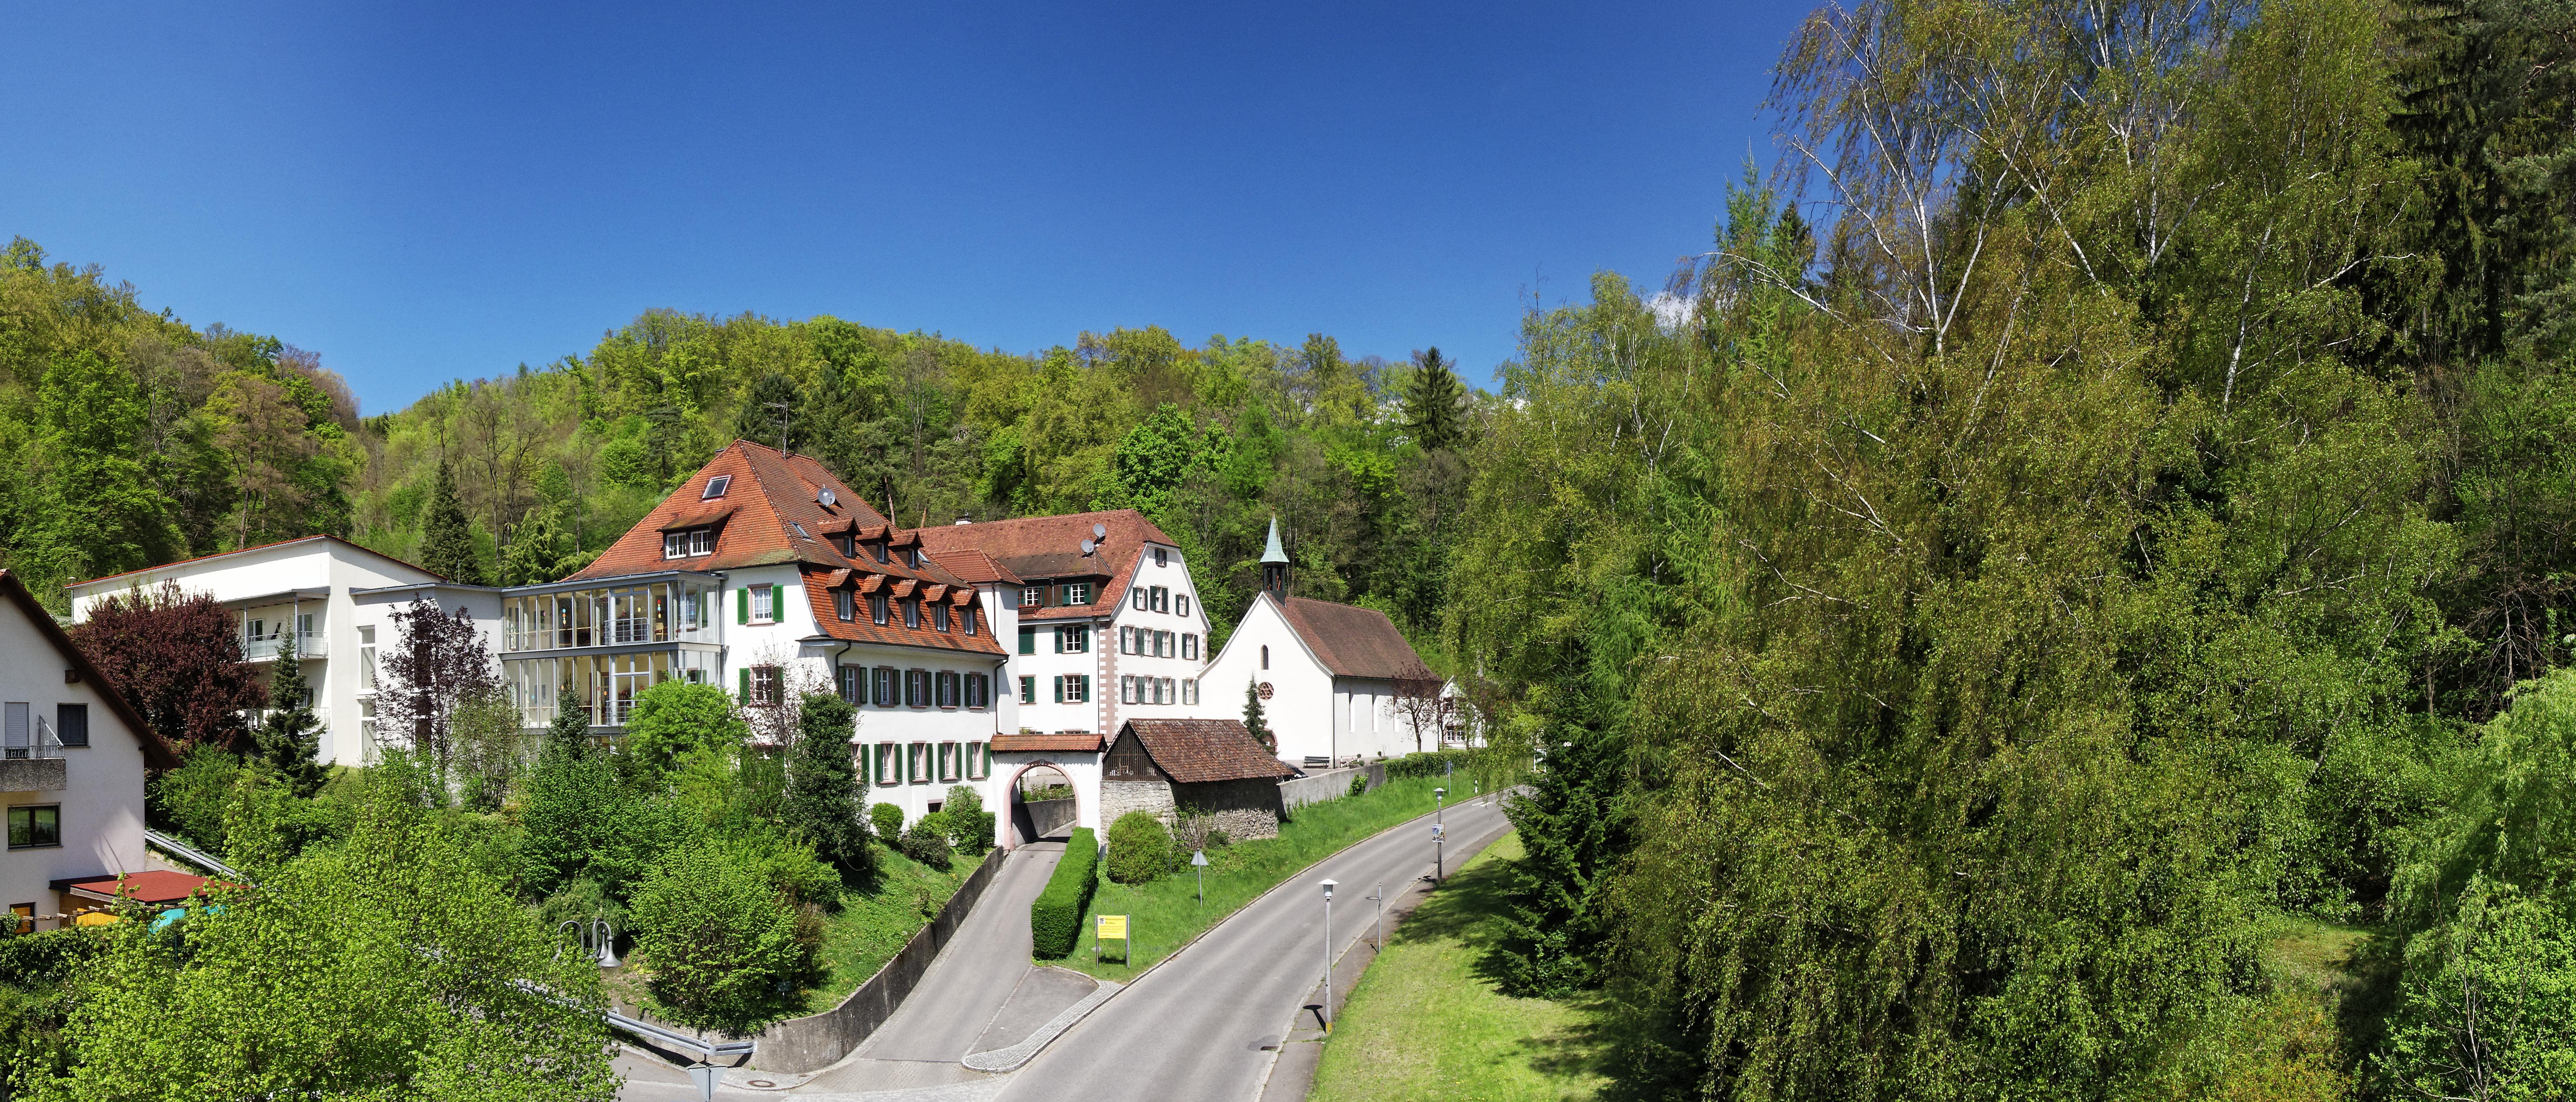 Himmelspforte, Grenzach-Wyhlenn